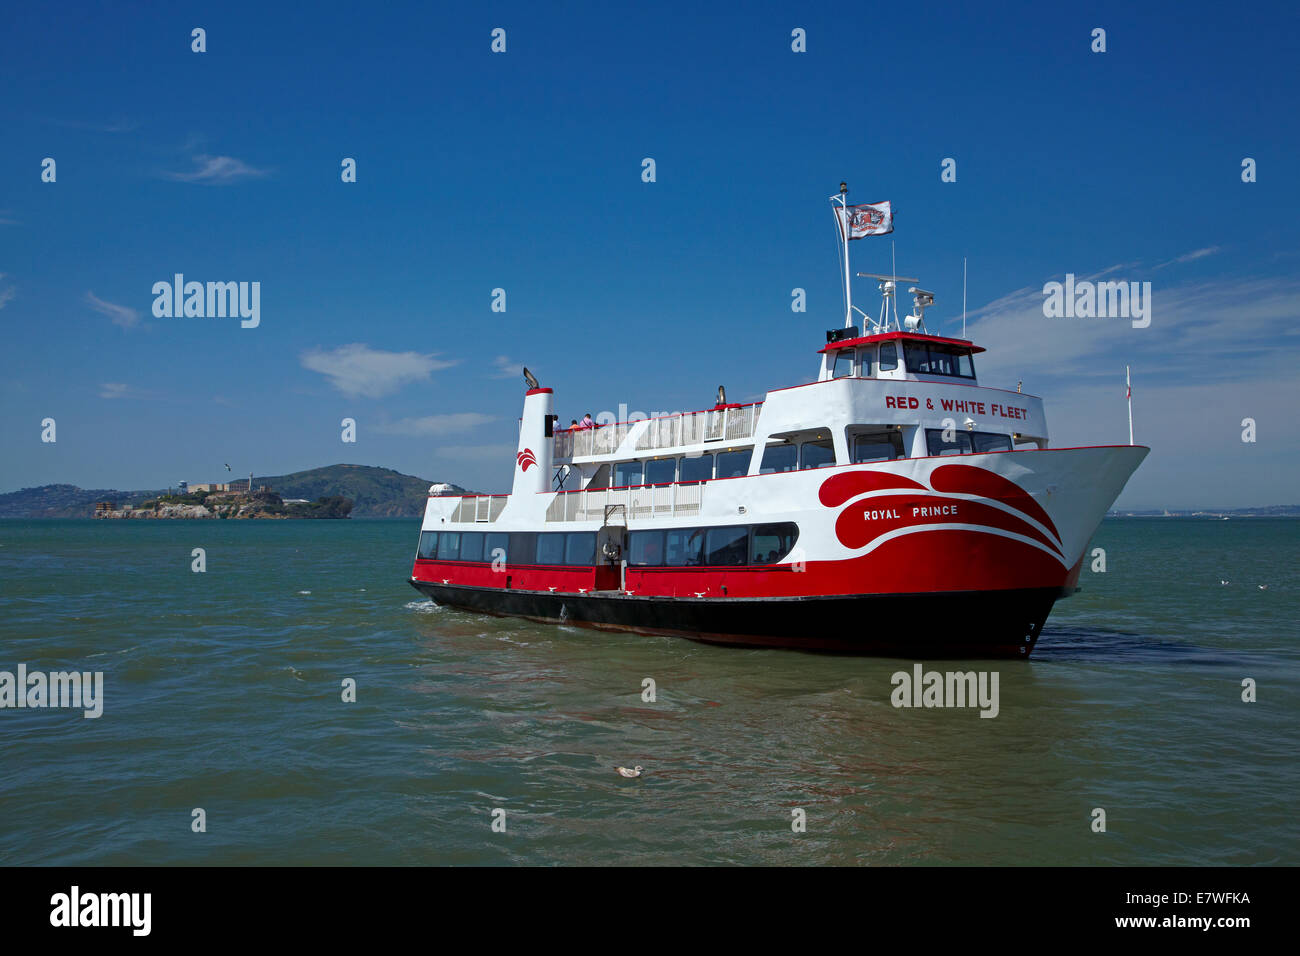 Royal Prince tour boat, Pier 43 1/2, Fishermans Wharf, and Alcatraz Island, San Francisco, California, USA - Stock Image